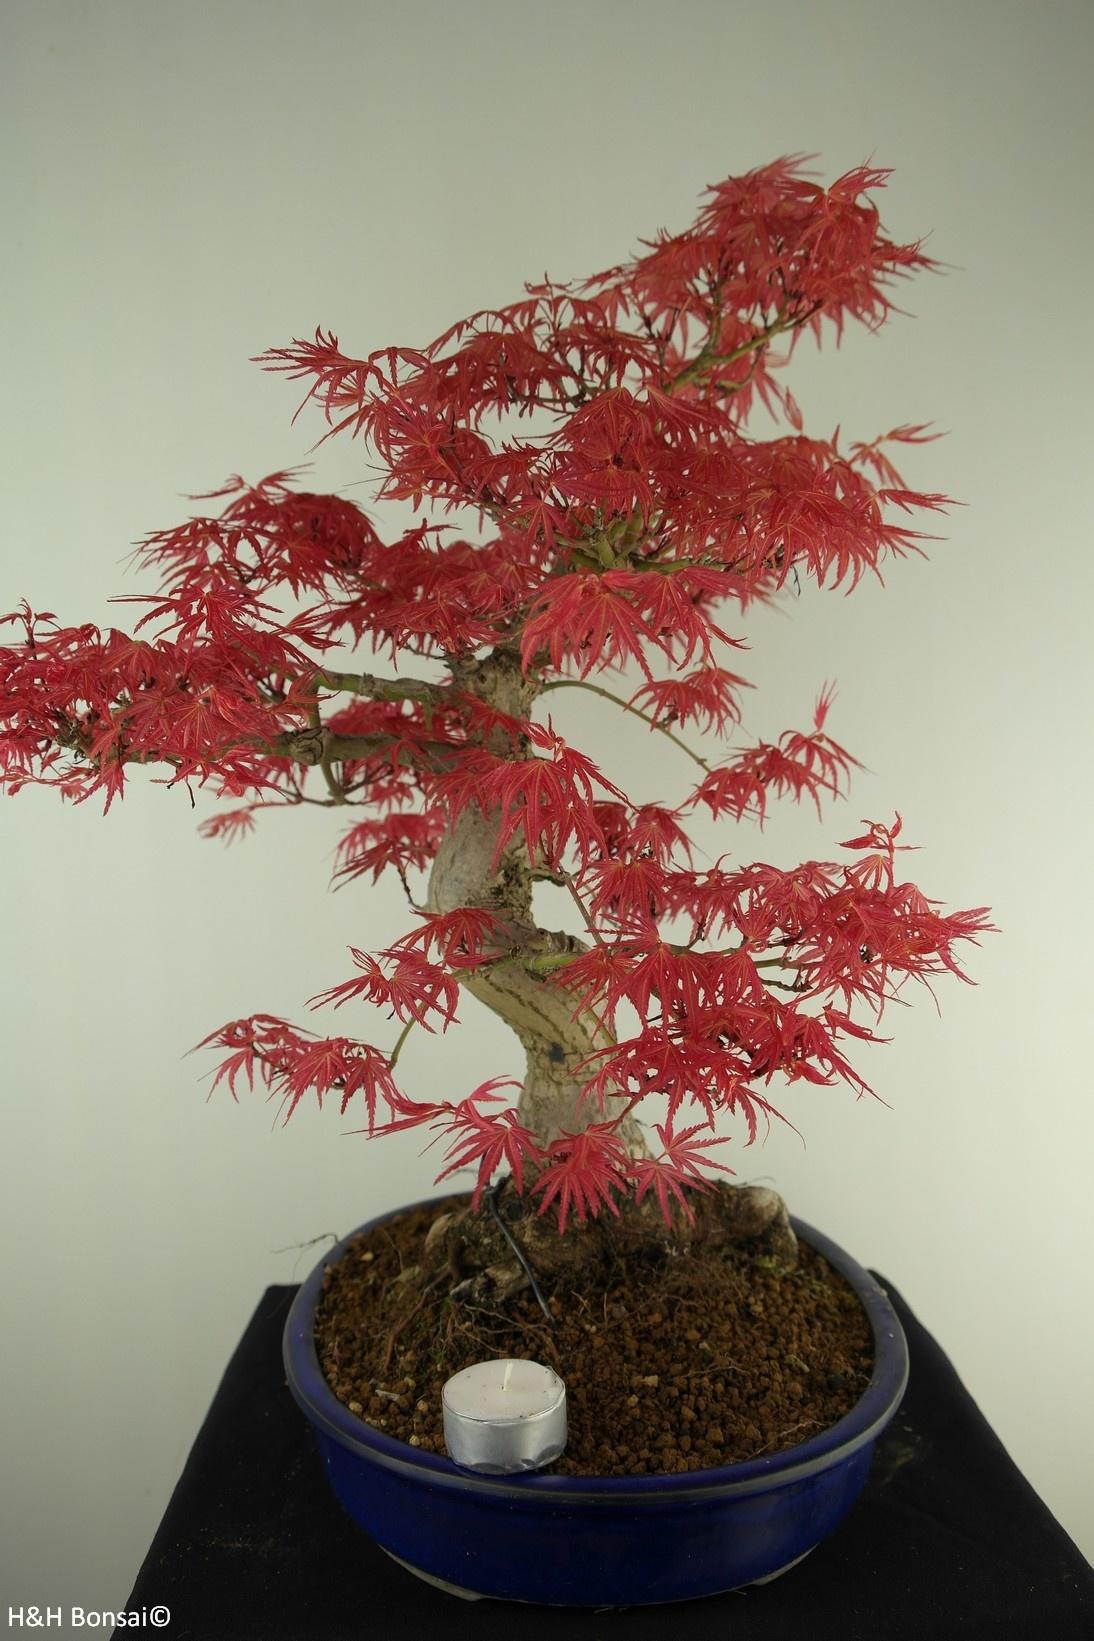 Bonsai Japanese Maple, Acer palmatum, no. 7765